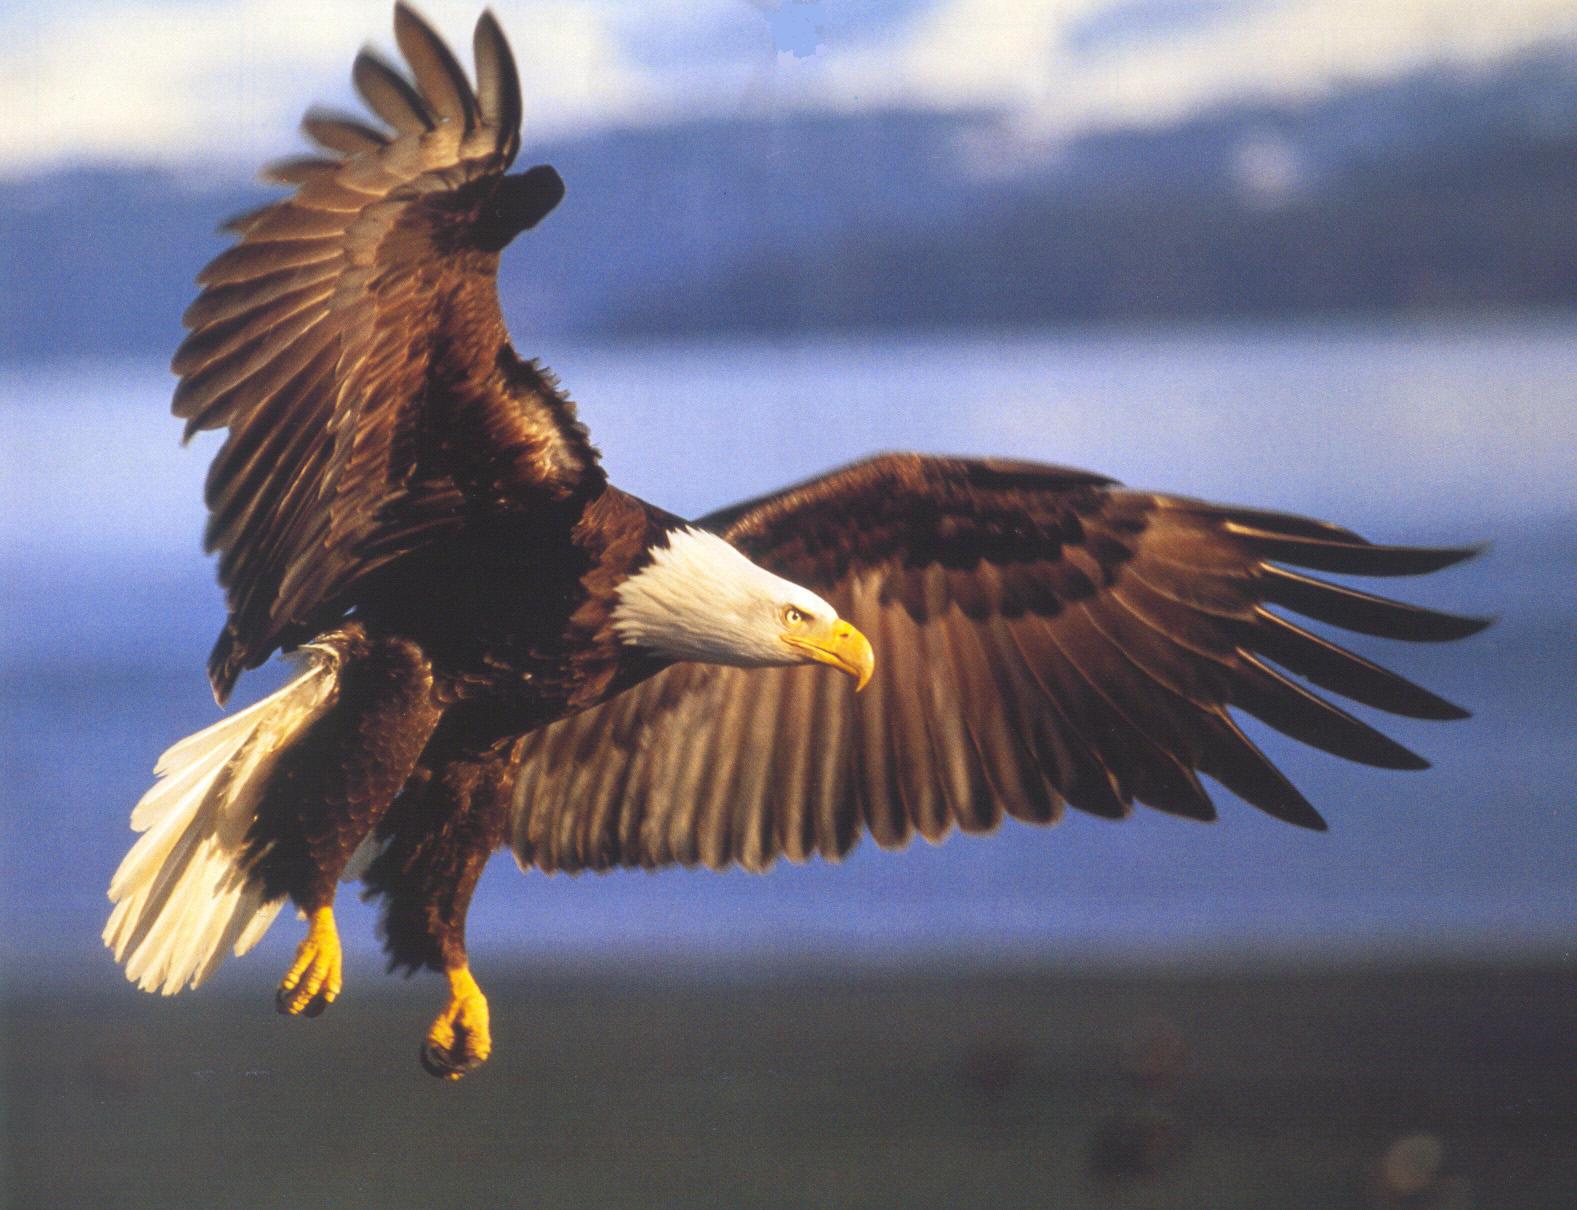 eagle-truth-love-justice-beloved-earth.jpg